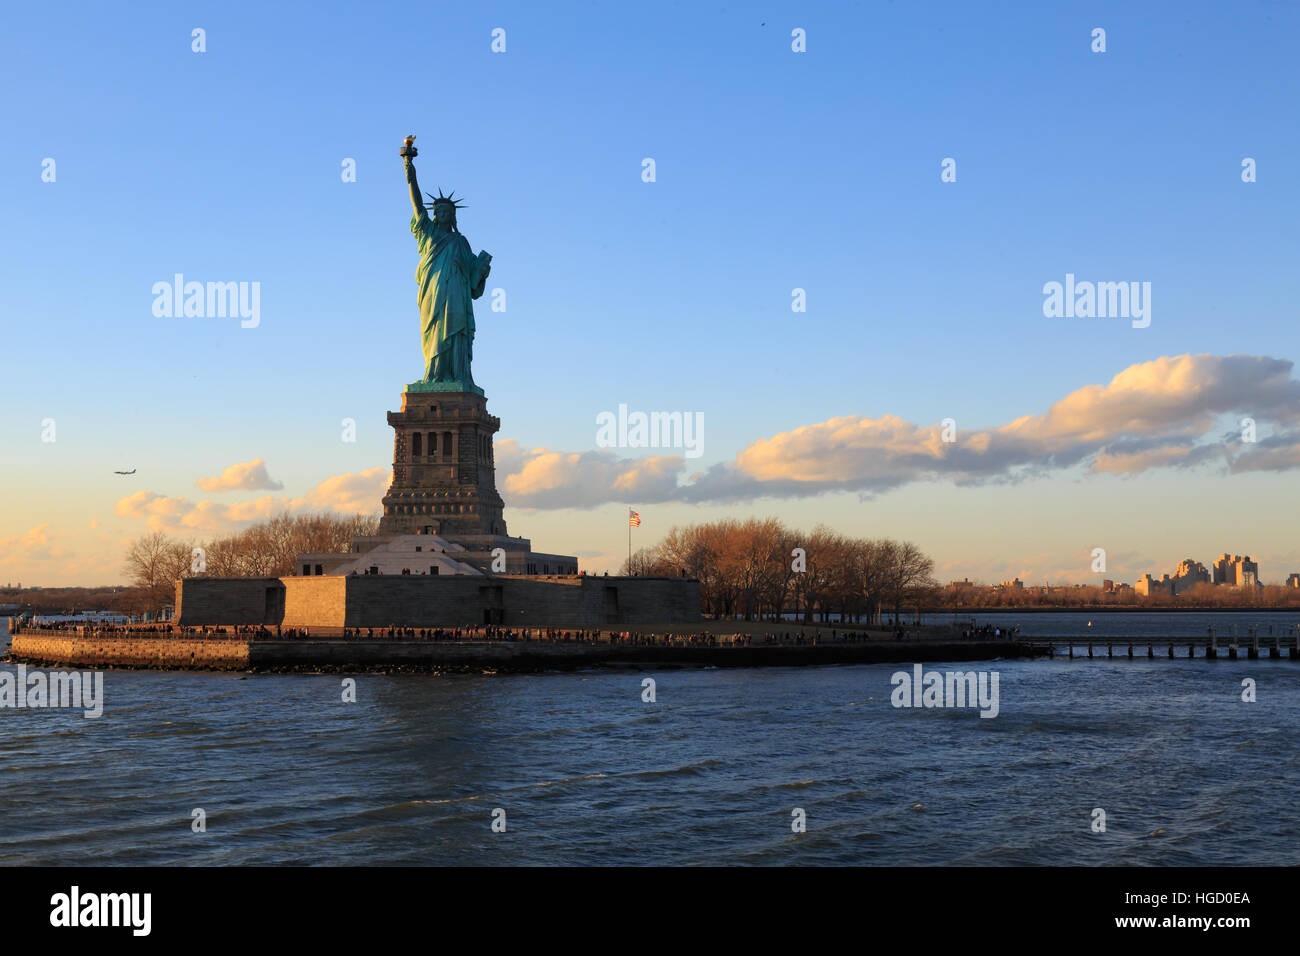 Statue de la liberté new york city. Photo Stock